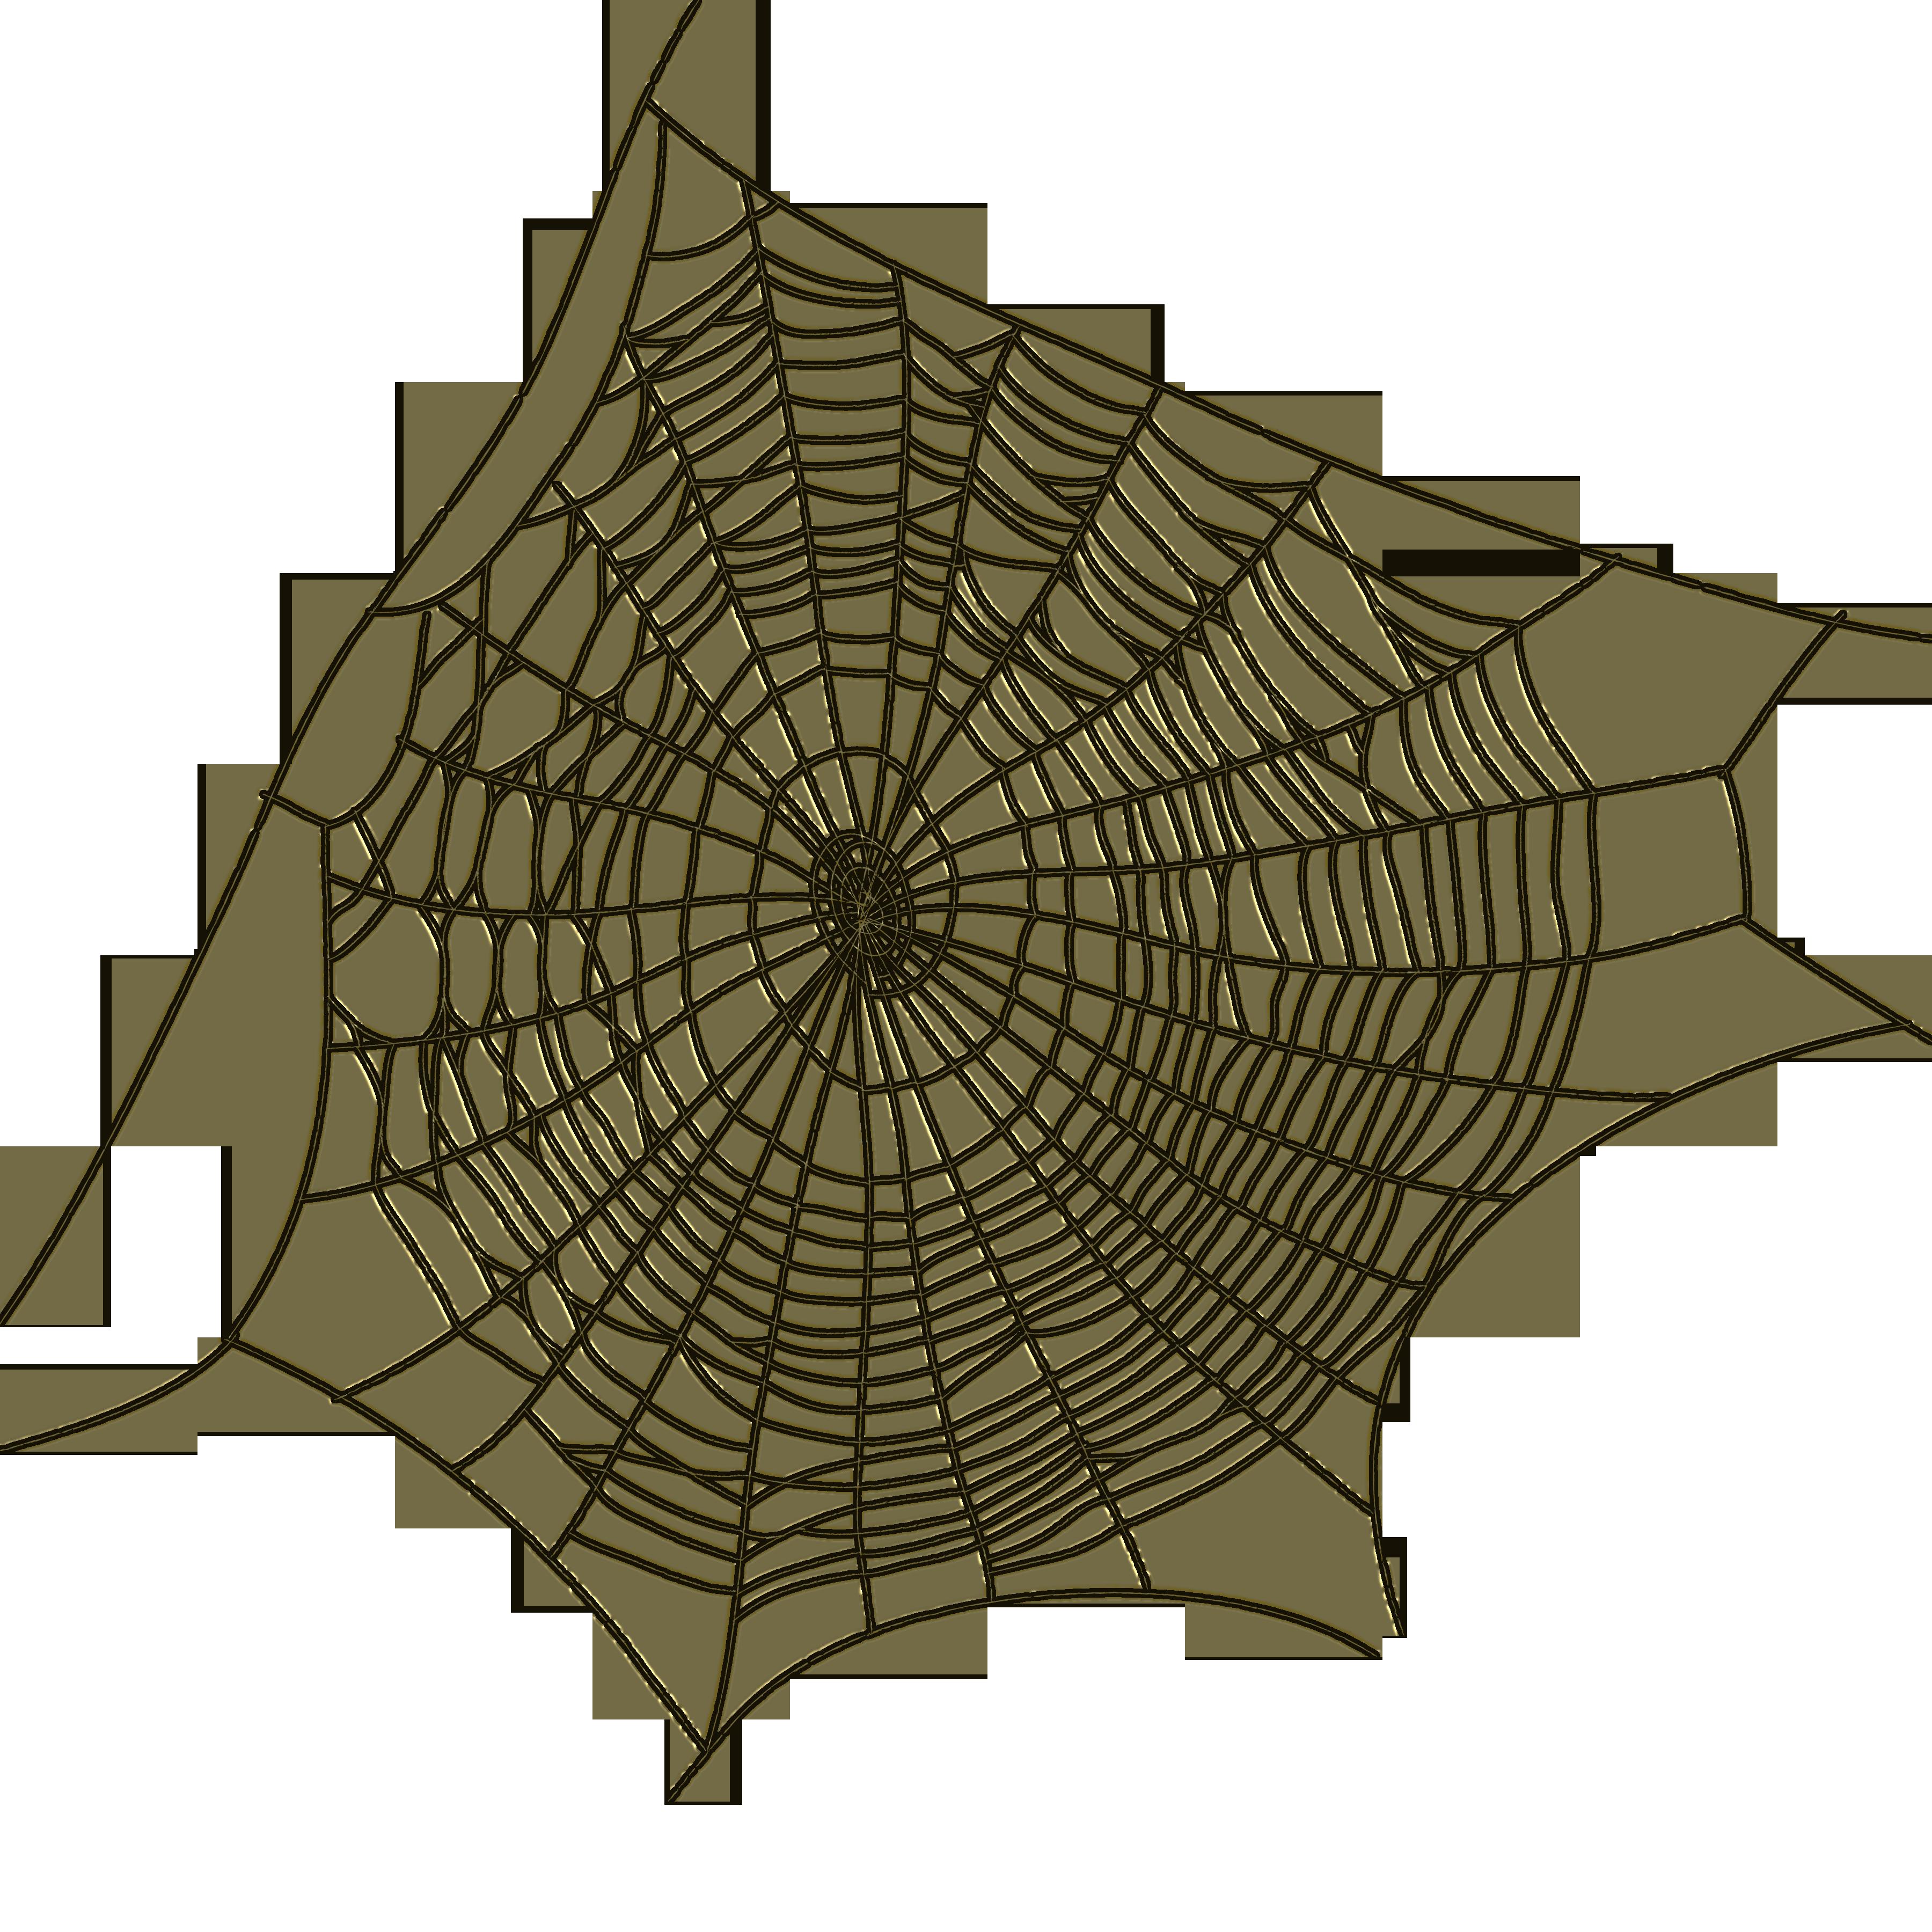 Download Web Angle Spider Drawing Free Frame Hq Png Image Freepngimg